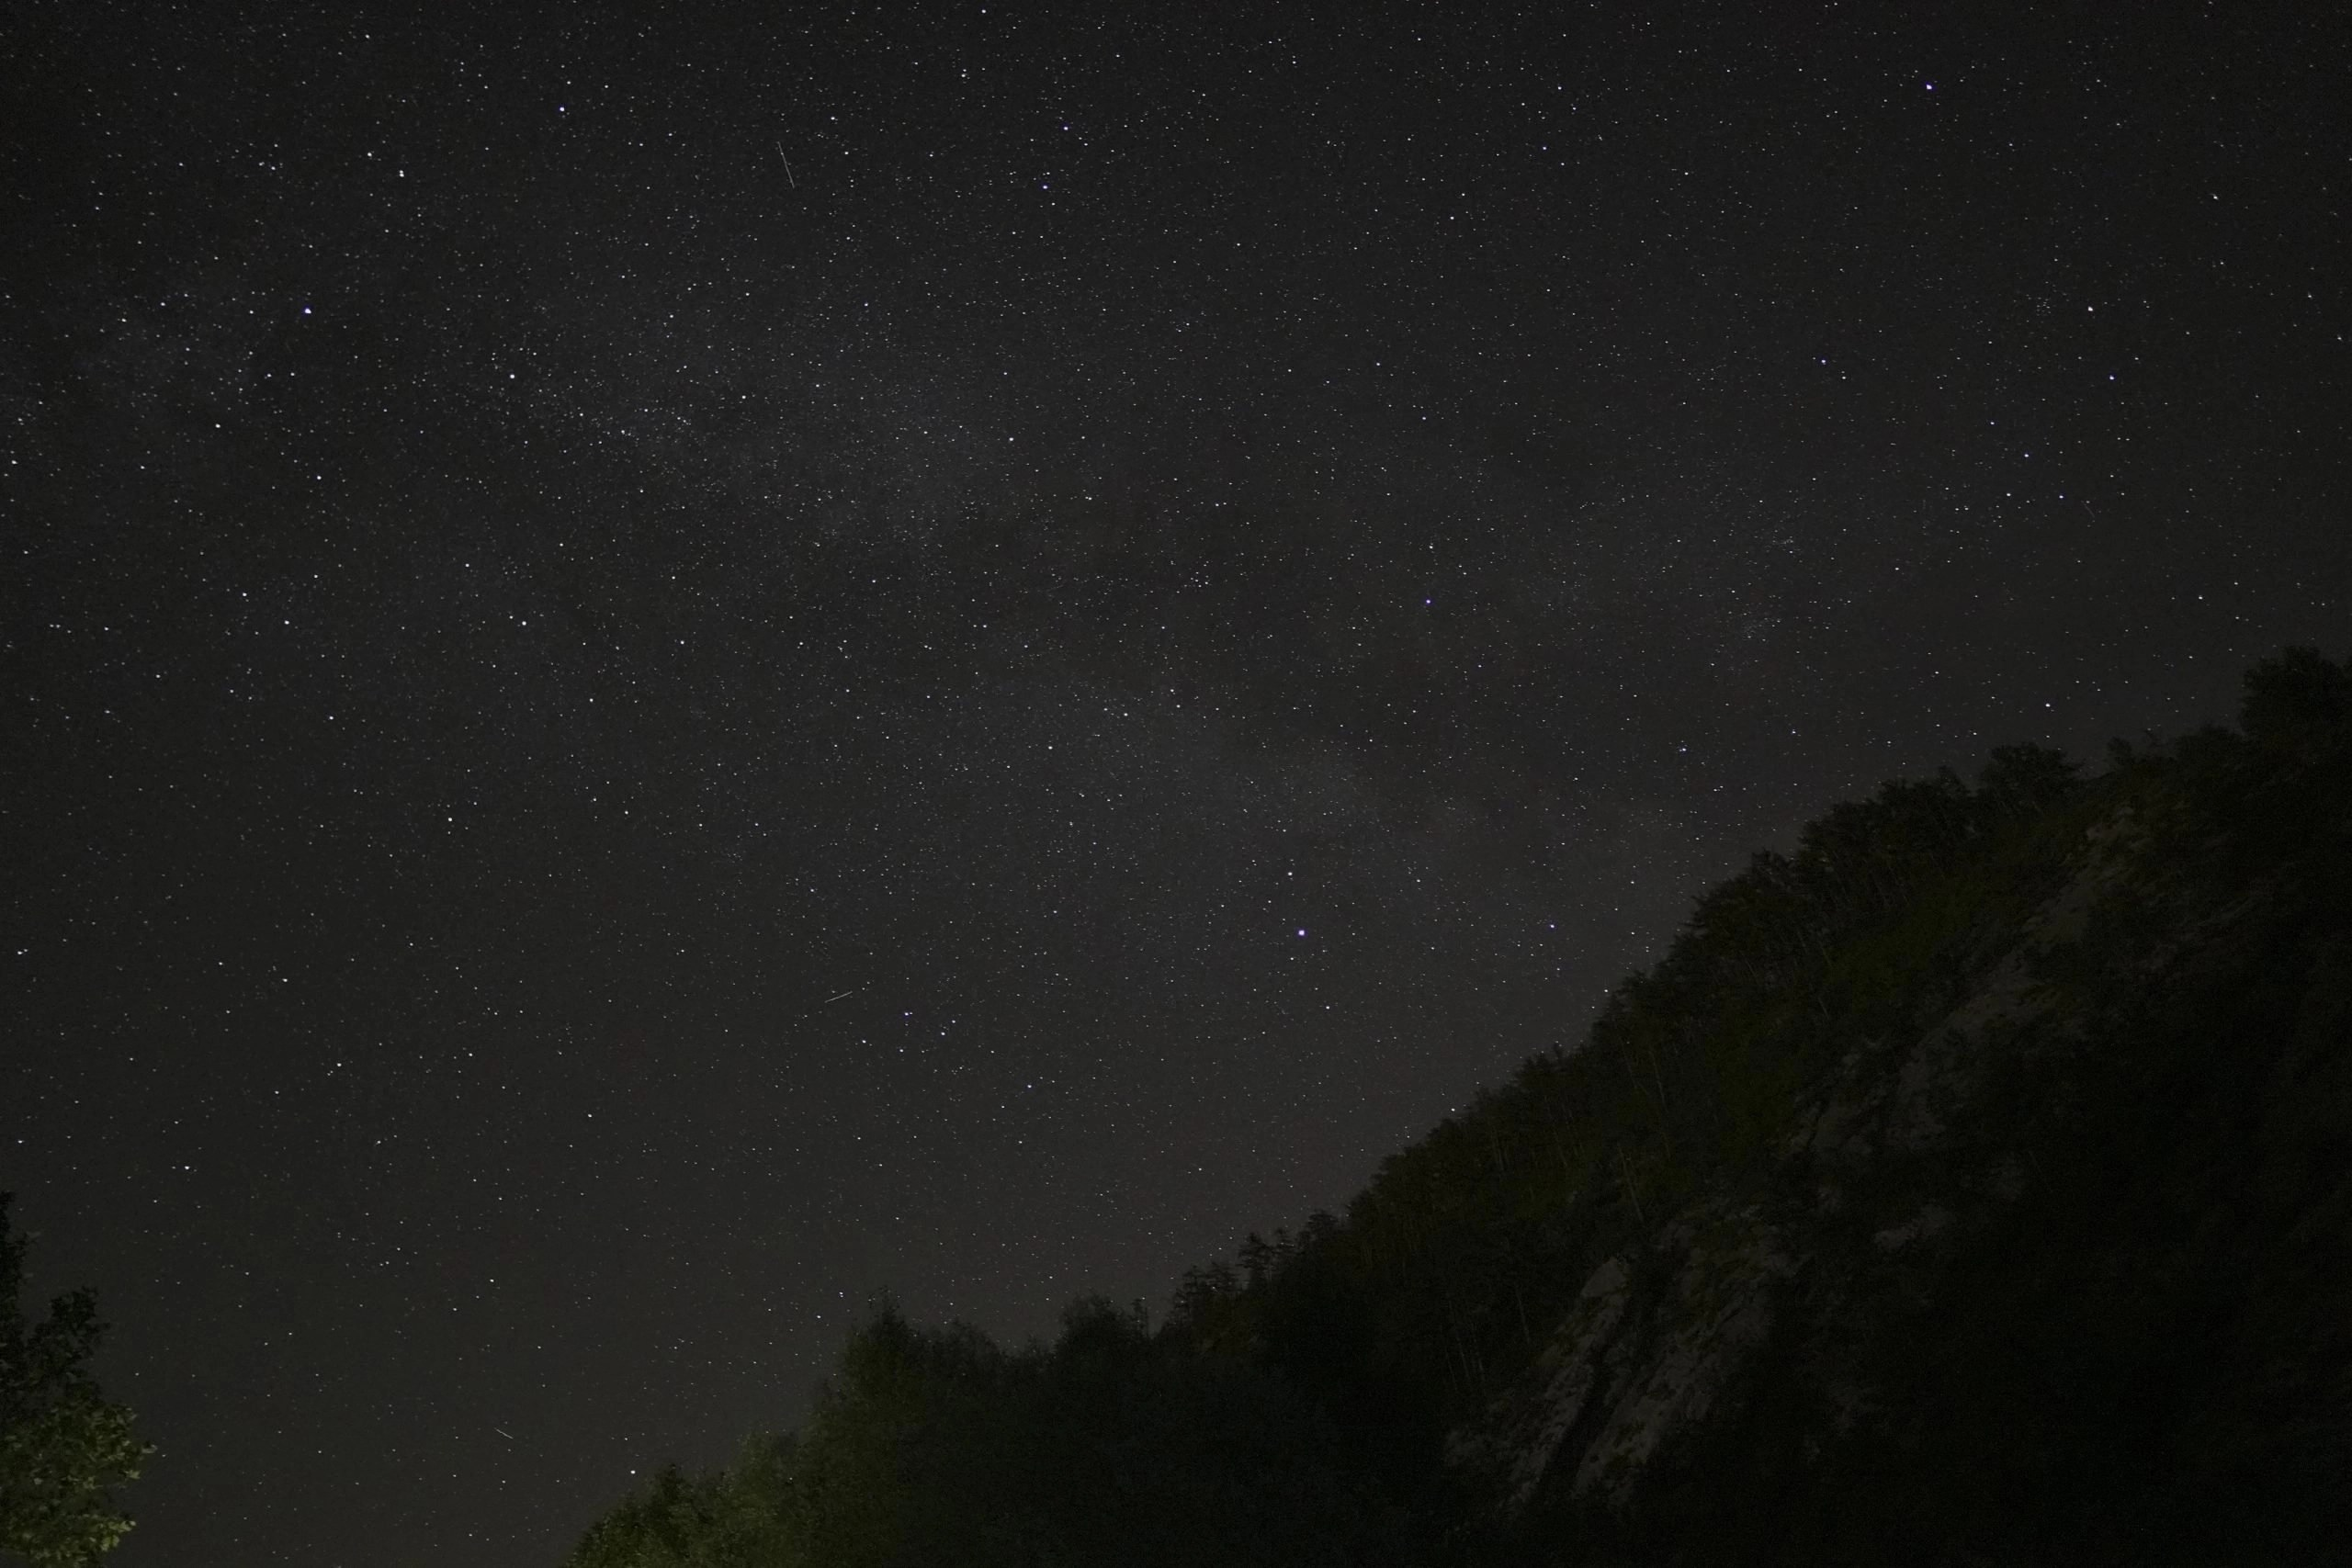 Darkness equals stars at night